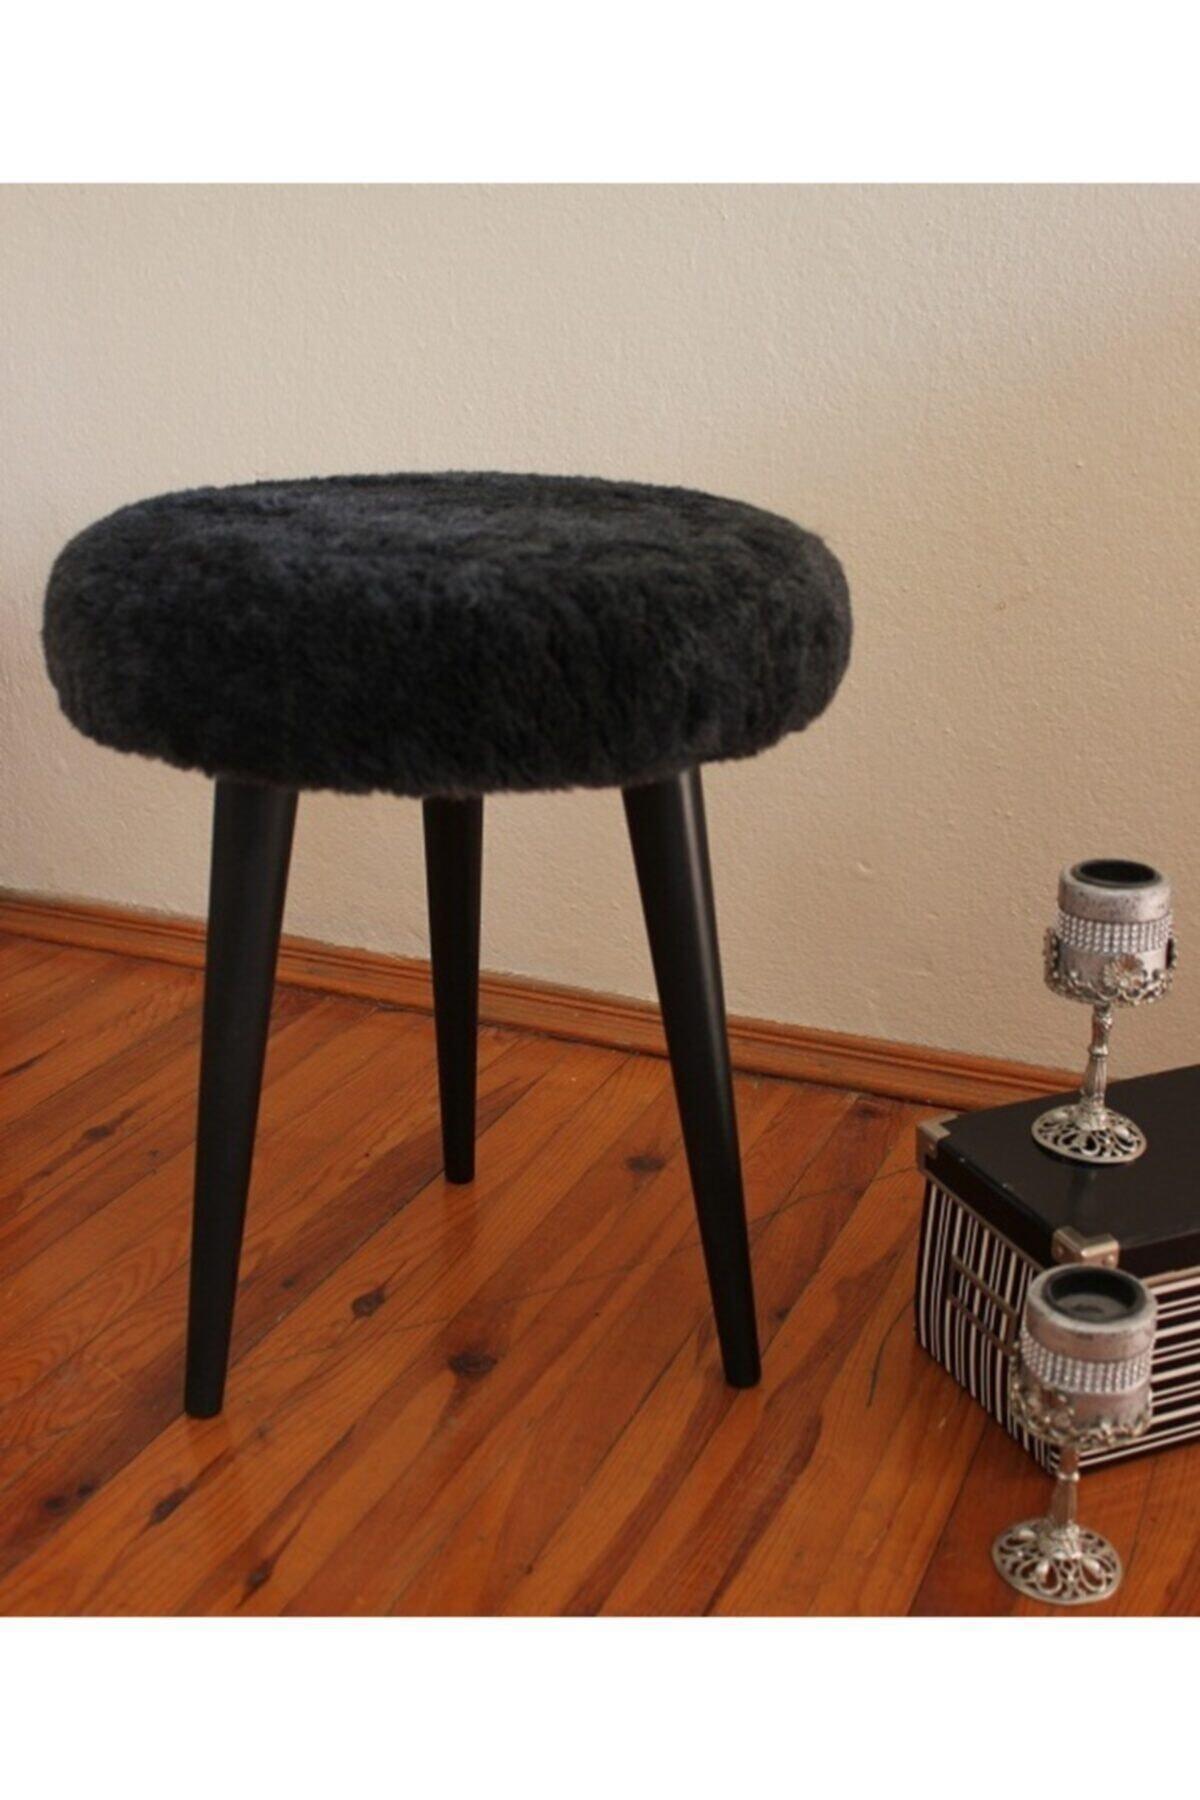 Neta Home Ahşap Ayak Dekoratif Antrasit Siyah Pelüş Puf Tabure Bench Yuvarlak Koltuk Sandalye